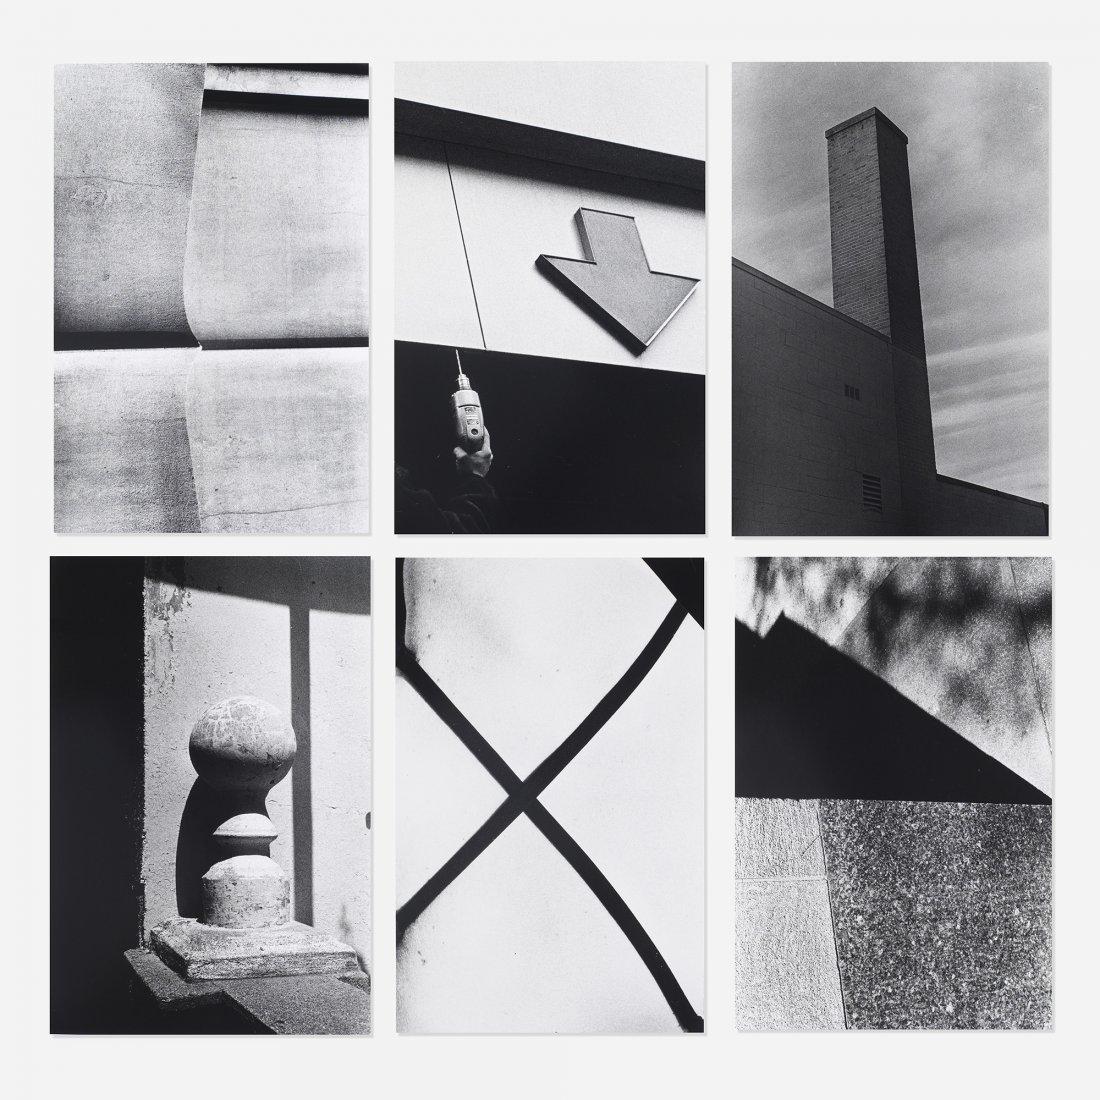 Ralph Gibson vintage photographs (six works)